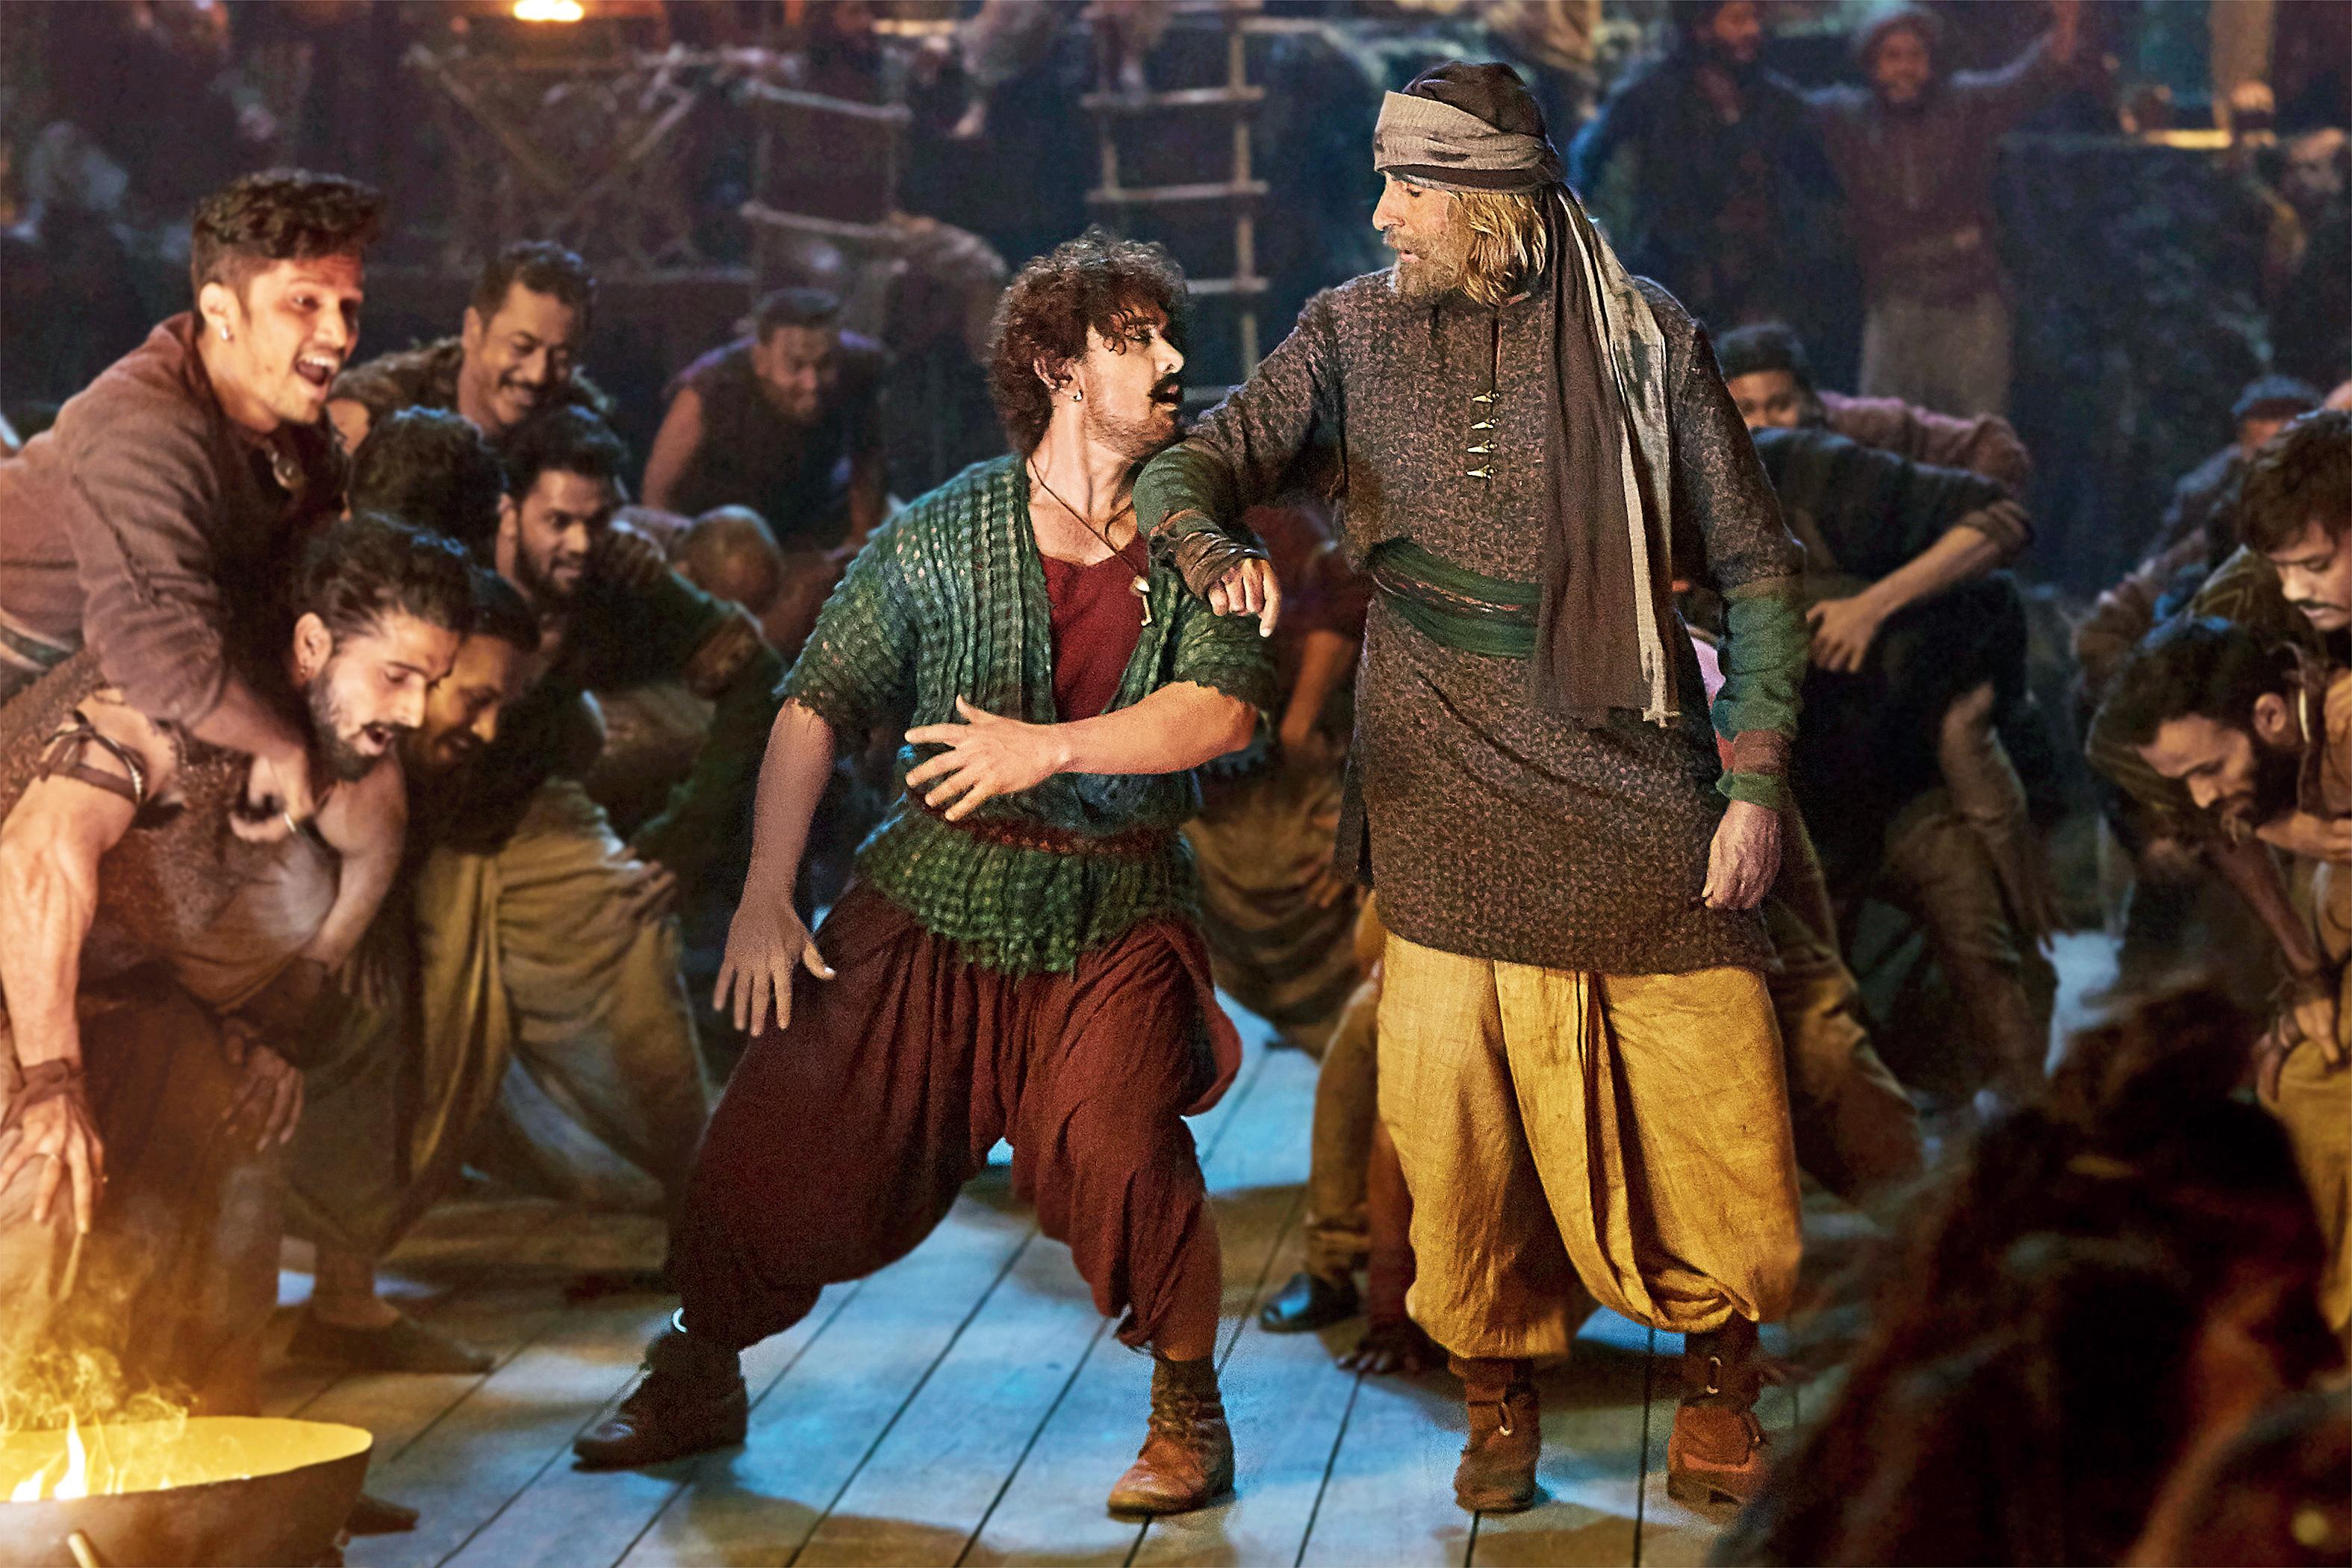 Aamir Khan & Amitabh Bachchan in a still from the film.